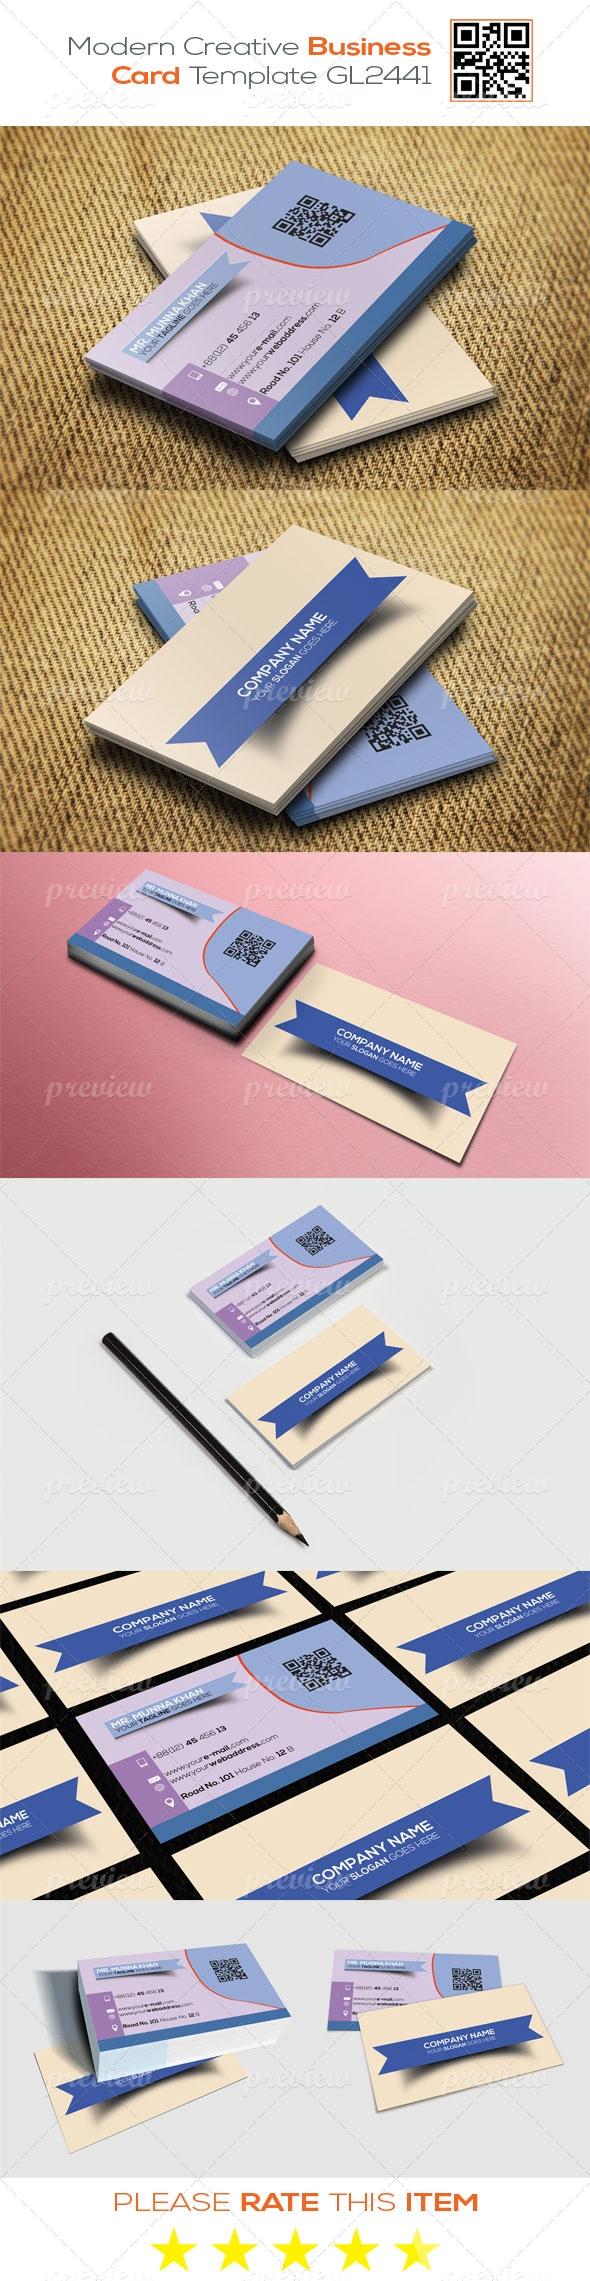 Modern Creative Business Card Template GL2441